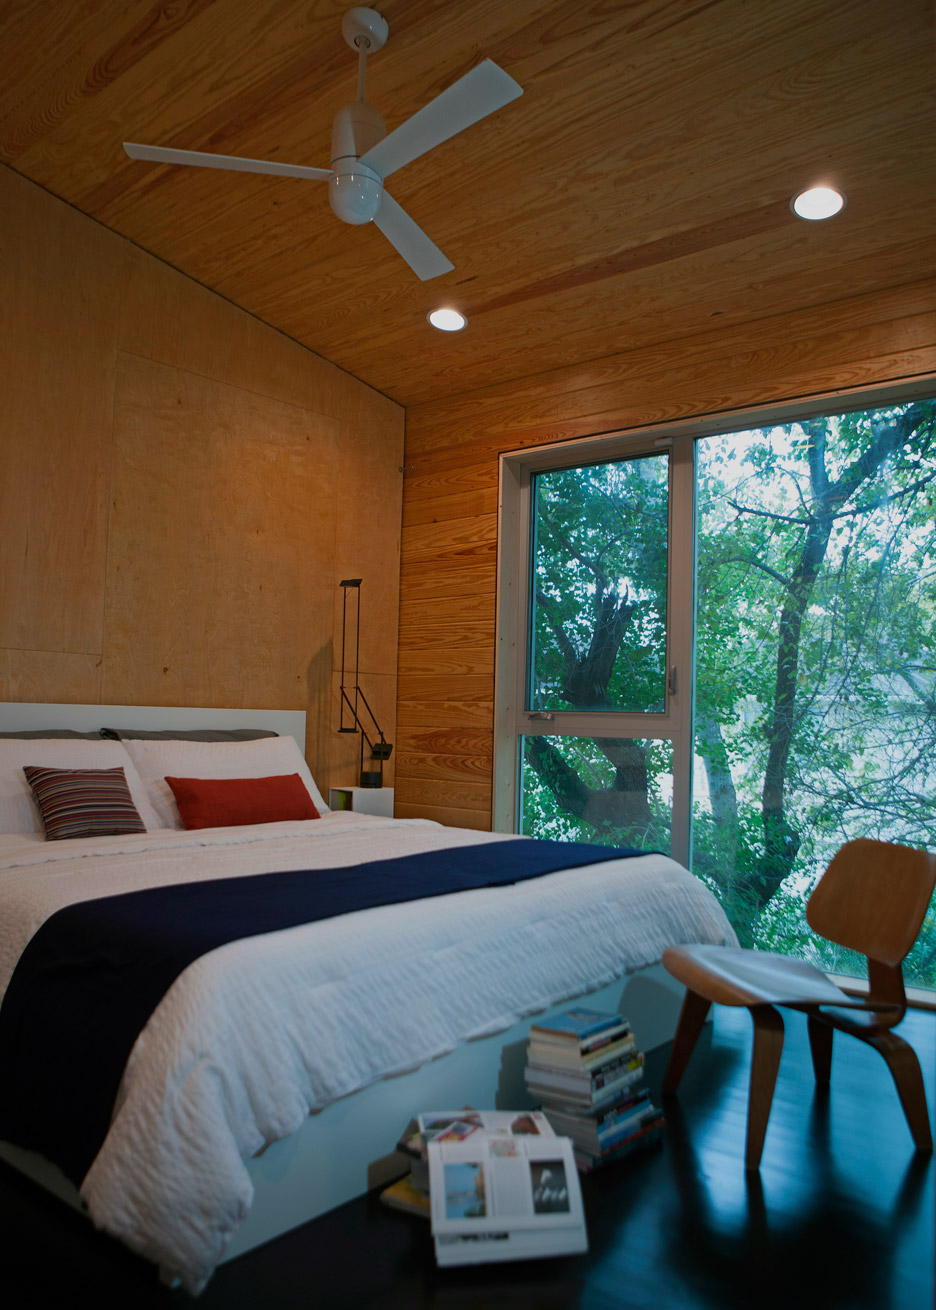 shotgun-chameleon-zdes-sustainable-house-timber-texas_dezeen_936_14